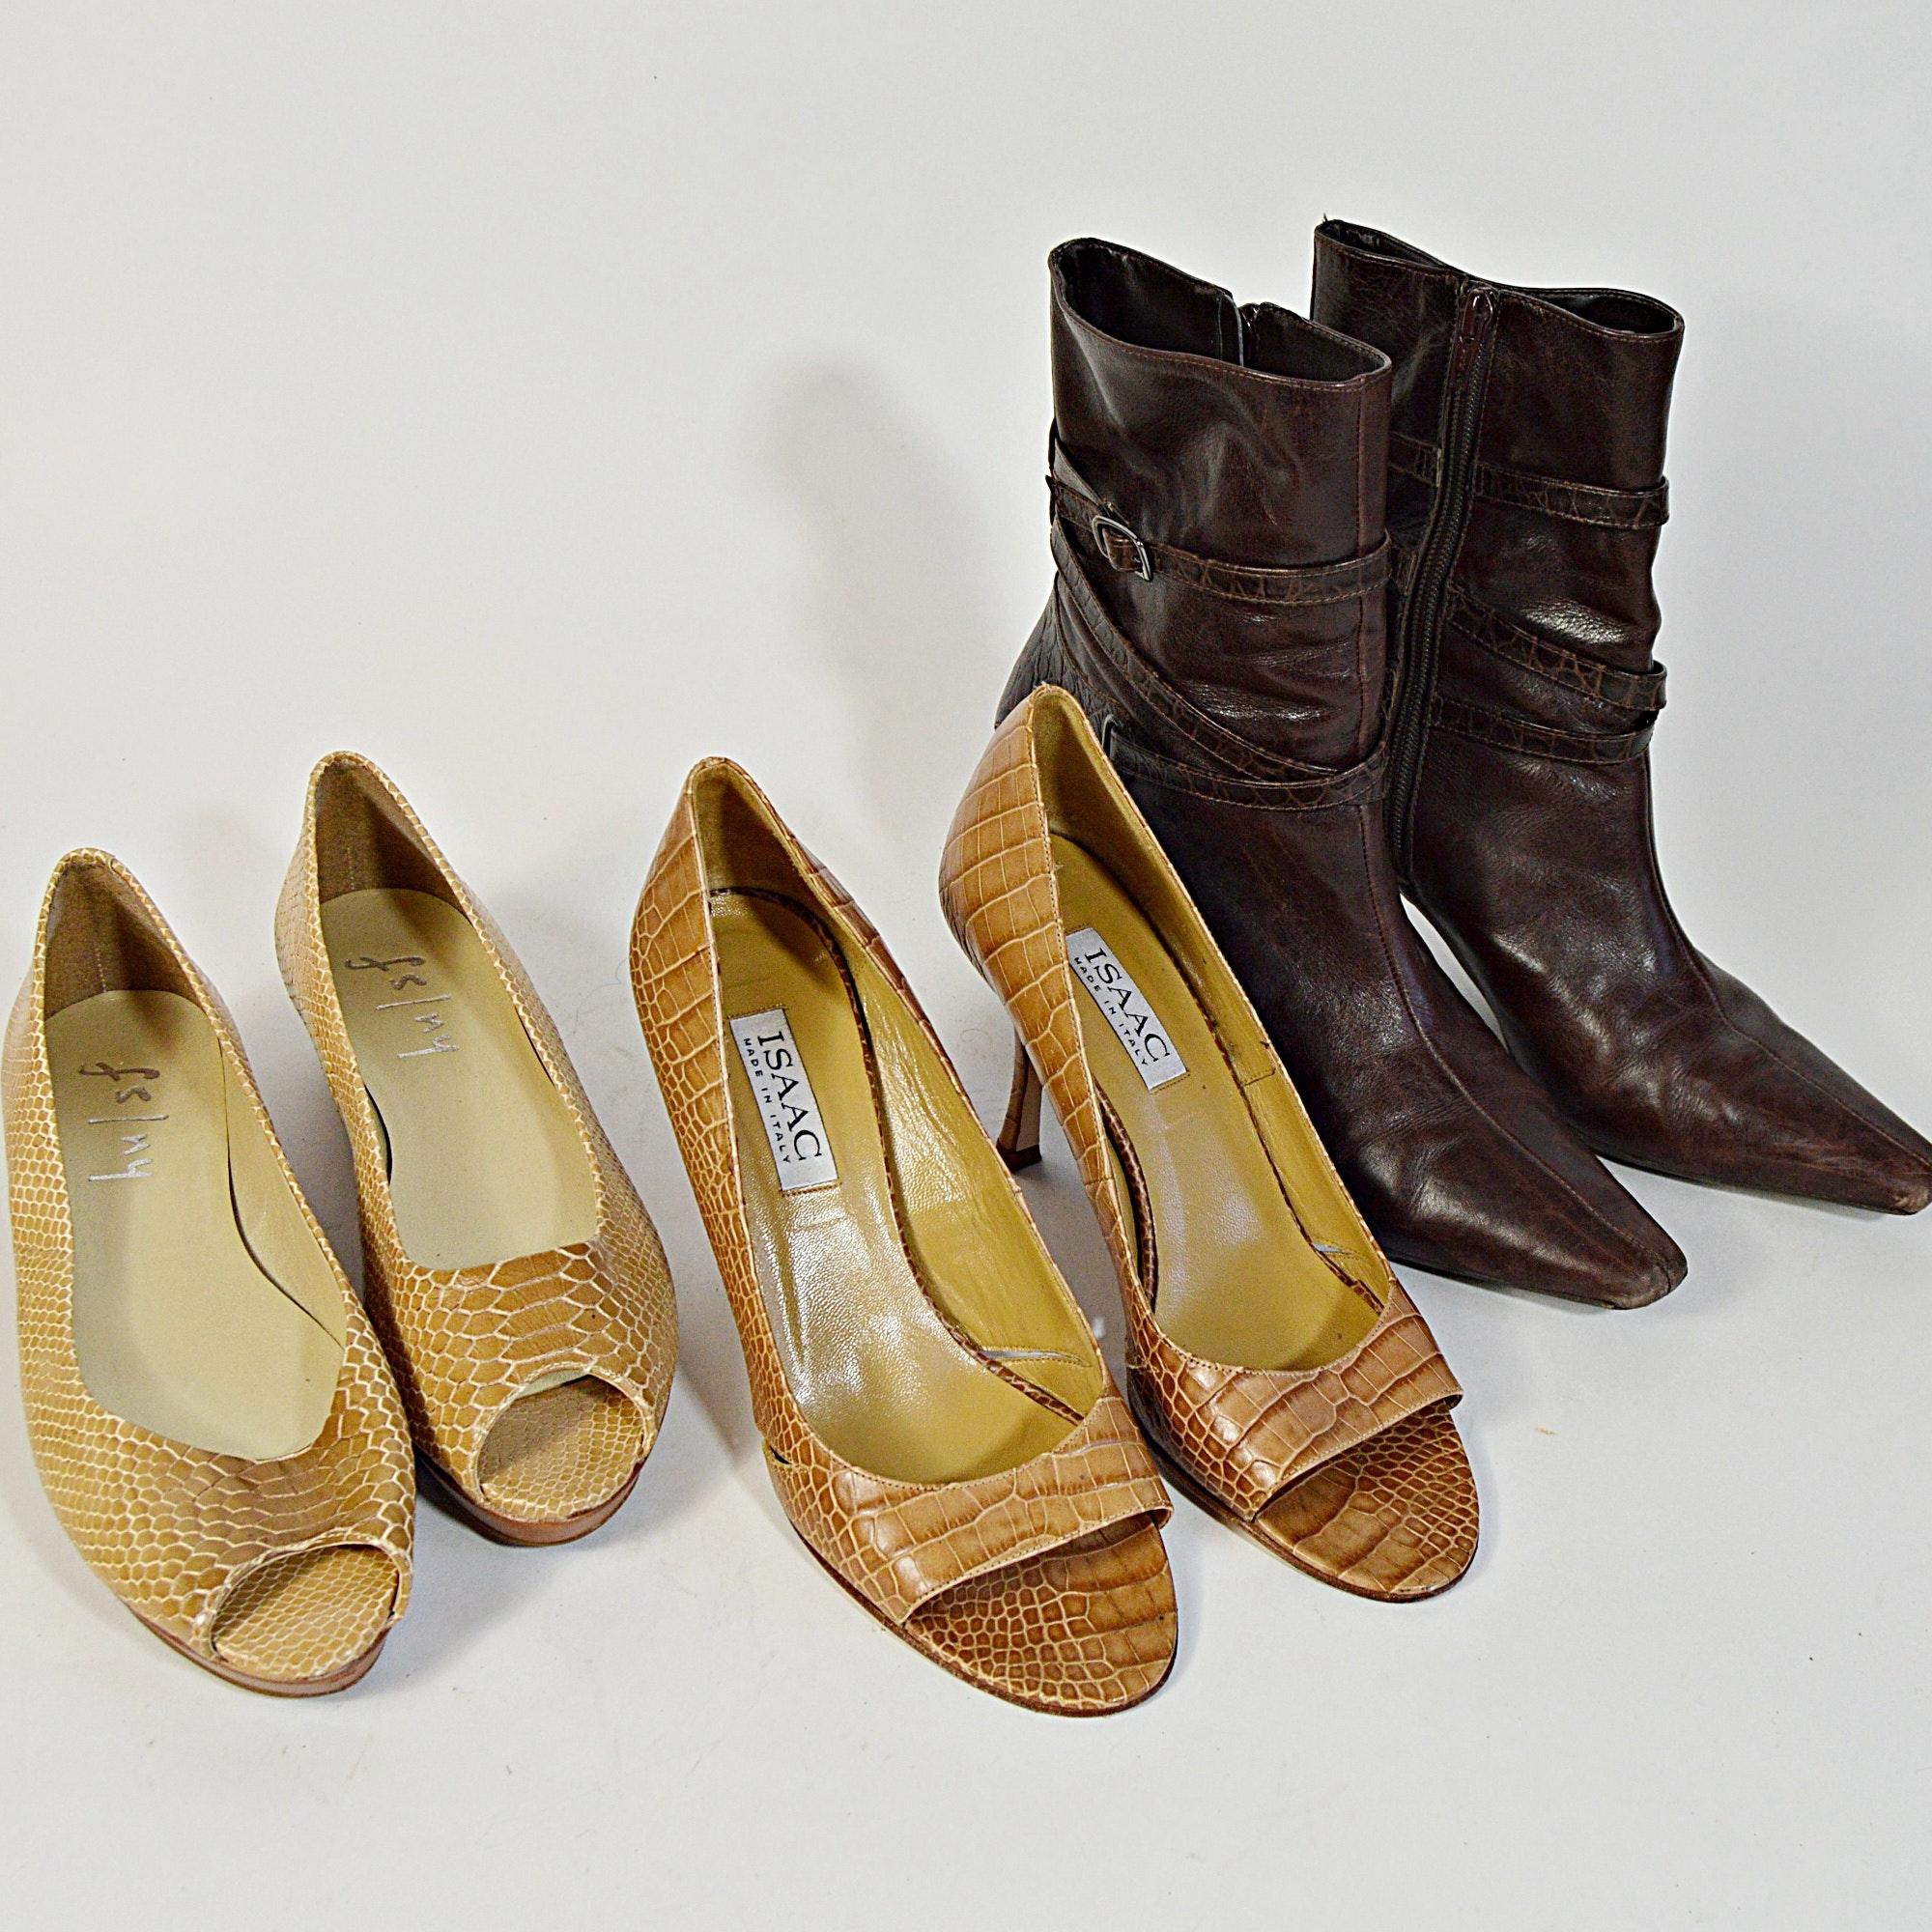 FS/NY, Isaac Shoes and Antonio Melani Short Boots